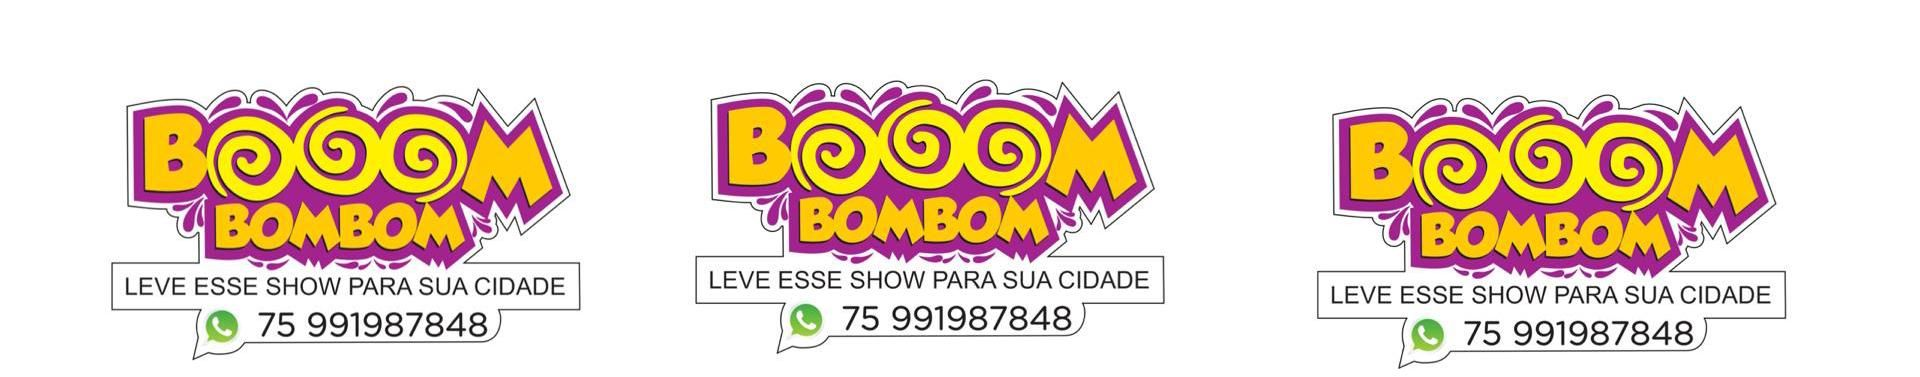 Imagem de capa de BoOom Bombom